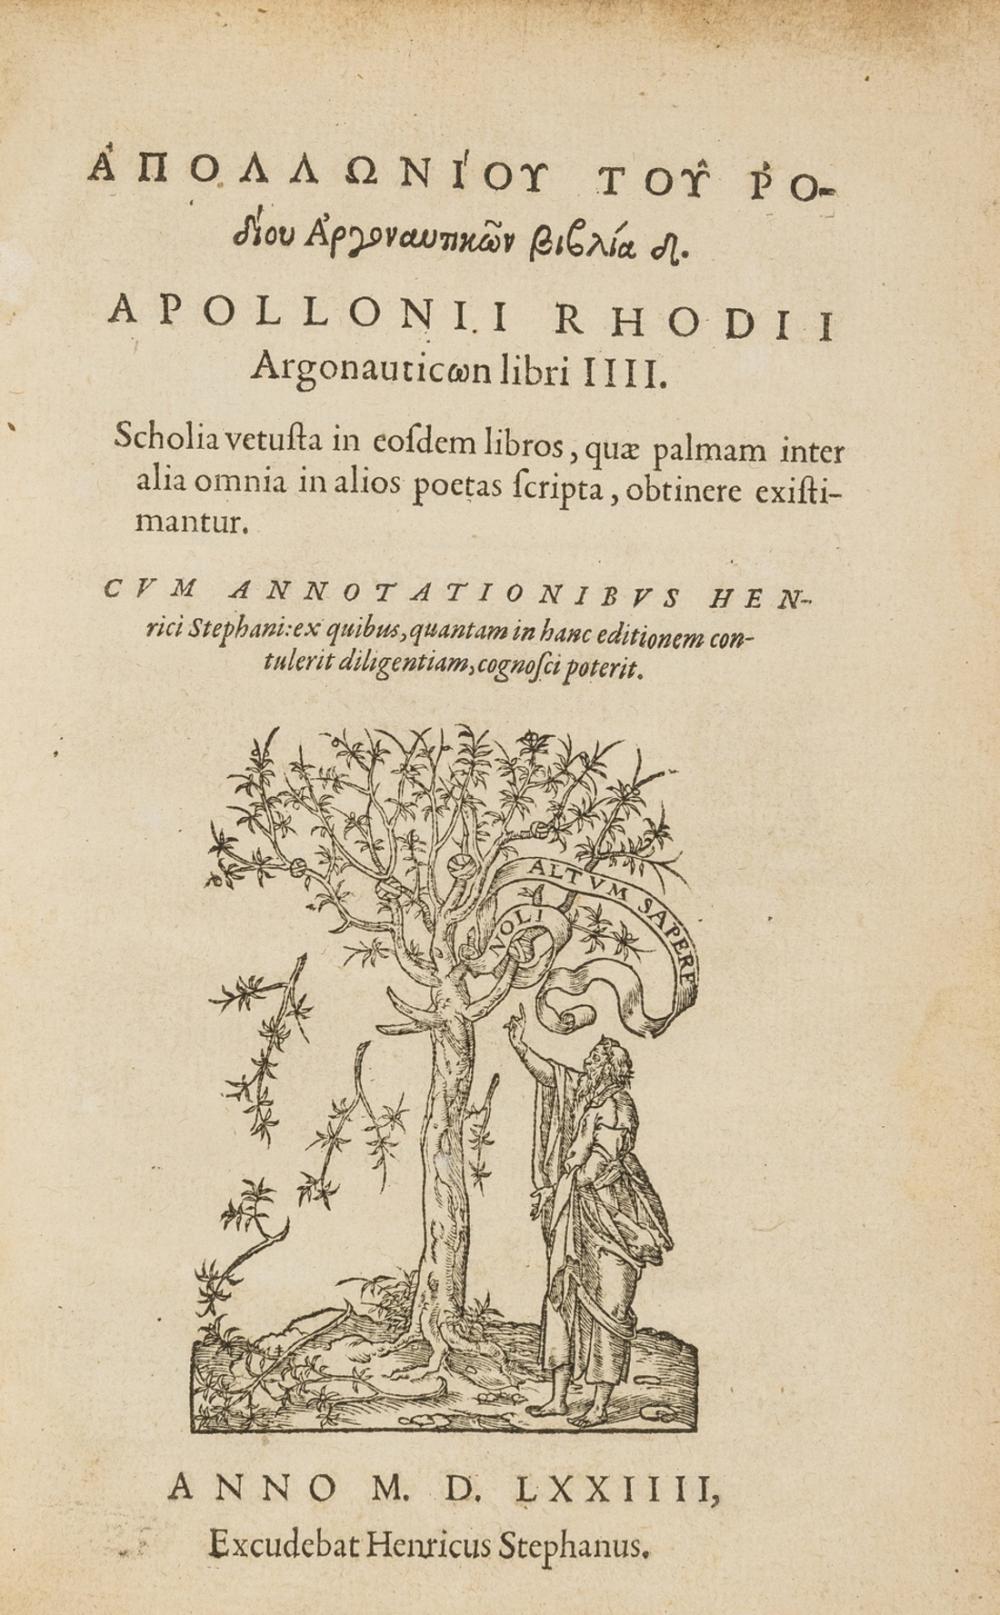 Estienne.- Apollonius Rhodius. Argonauticon libri IIII, edited by Henri Estienne, Geneva, Henri Estienne, 1574.